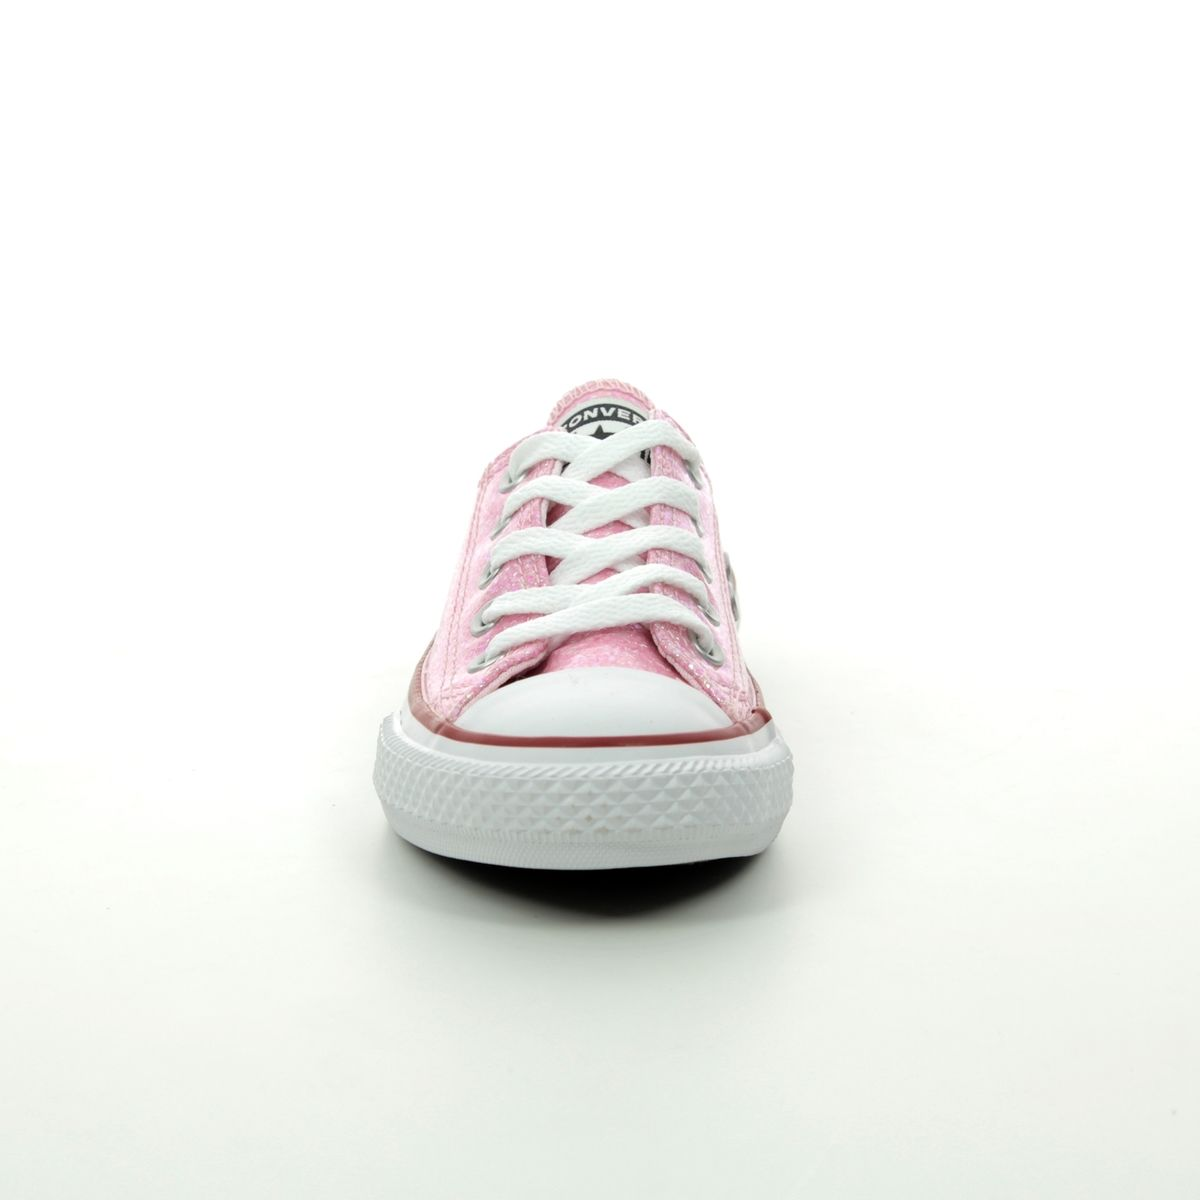 e7af0e749e9 Converse Trainers - Pink - 663628C ALLSTAR OX JUNIOR